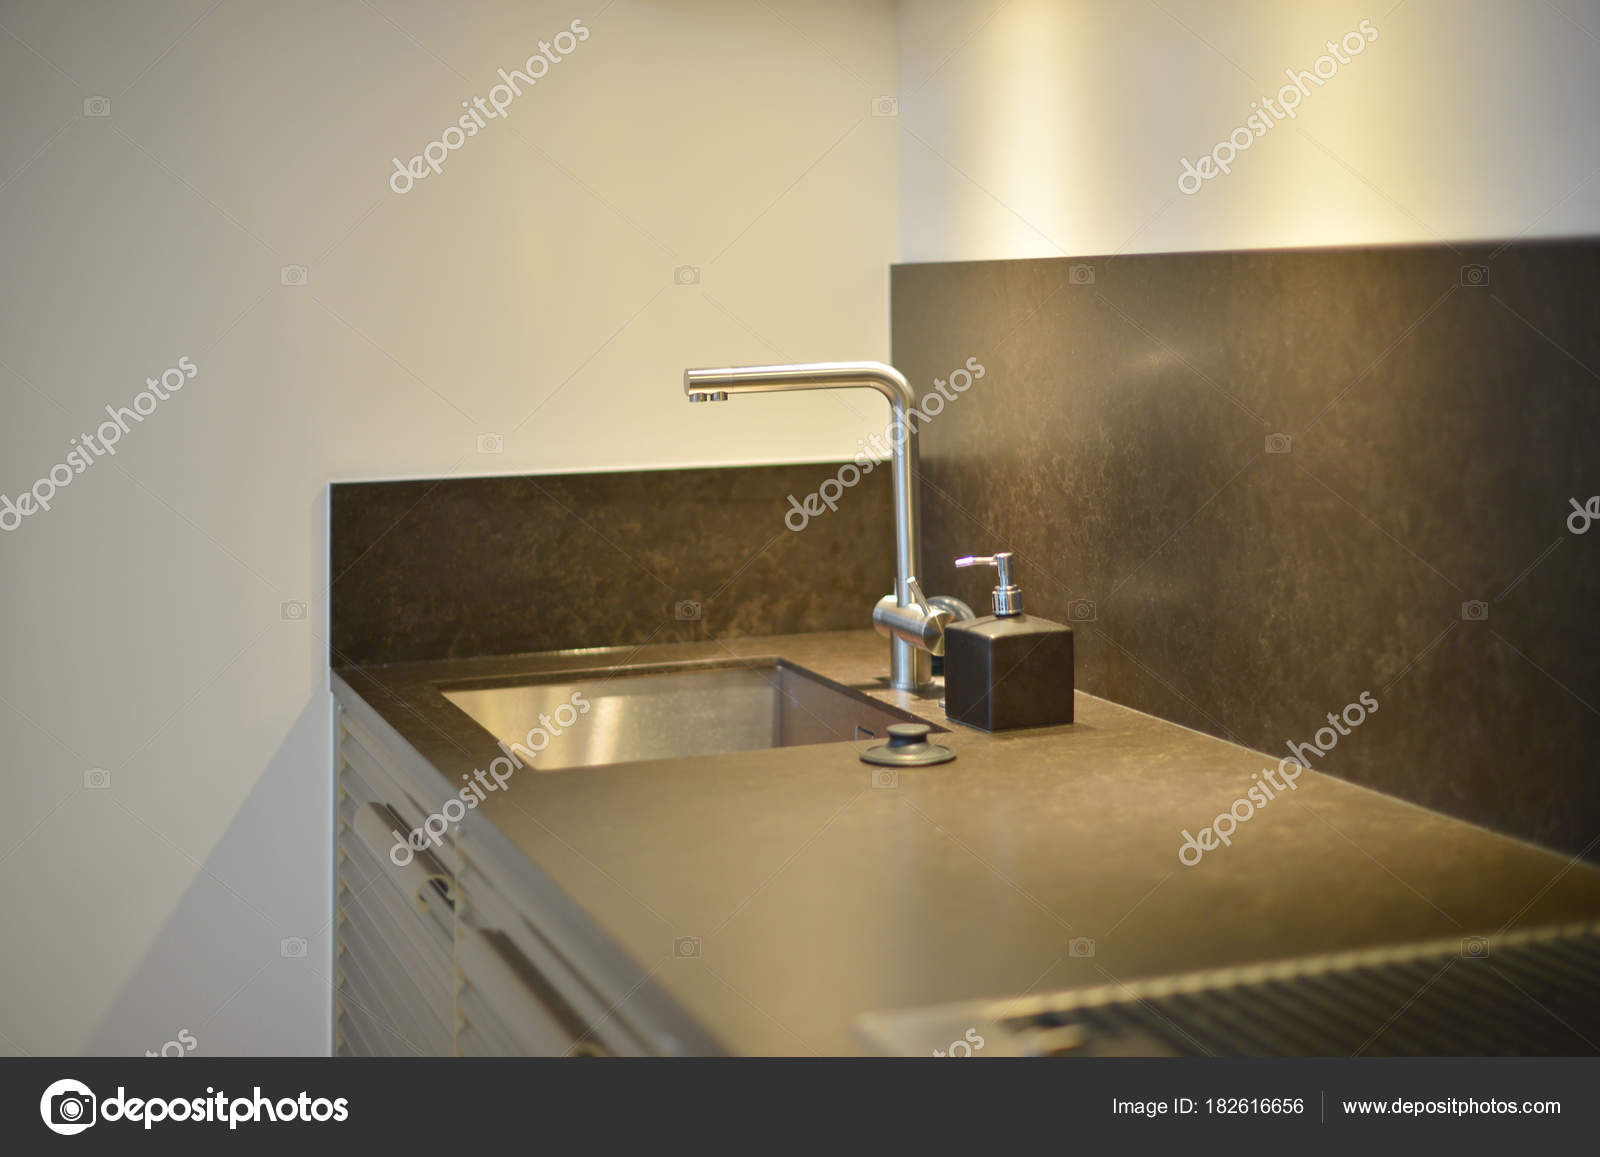 black sink kitchen cabinet sets for sale 厨房带照明的黑色水槽上的豪华水龙头 图库照片 c tampatra hotmail com